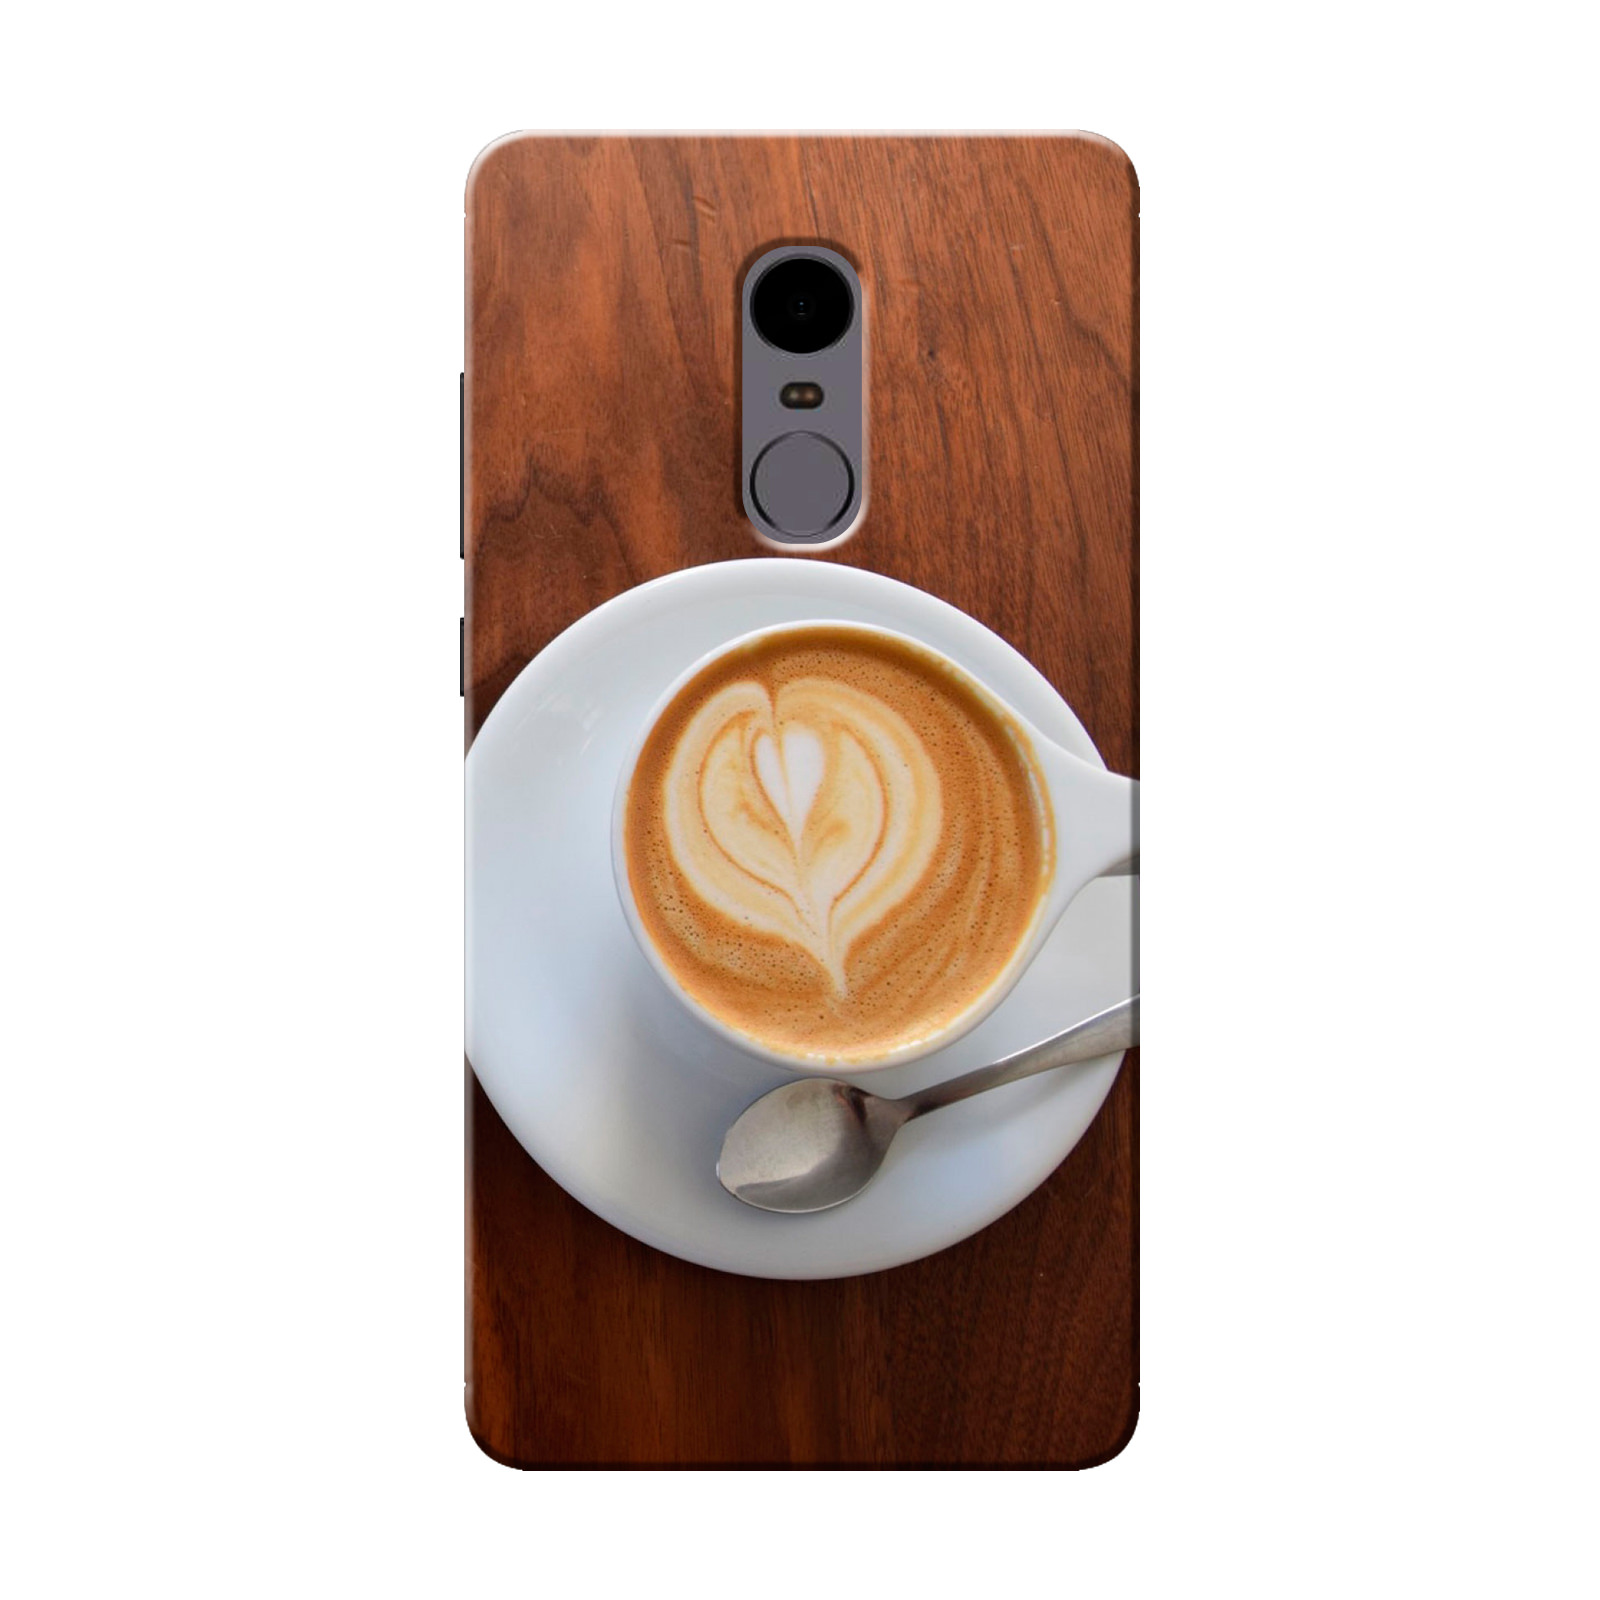 sairafashions Wild Thunder Mi Redmi Note 4 Mobile Back Cover Case And Designer Printed Hard Flexible Mobile Case Cover  - 1115